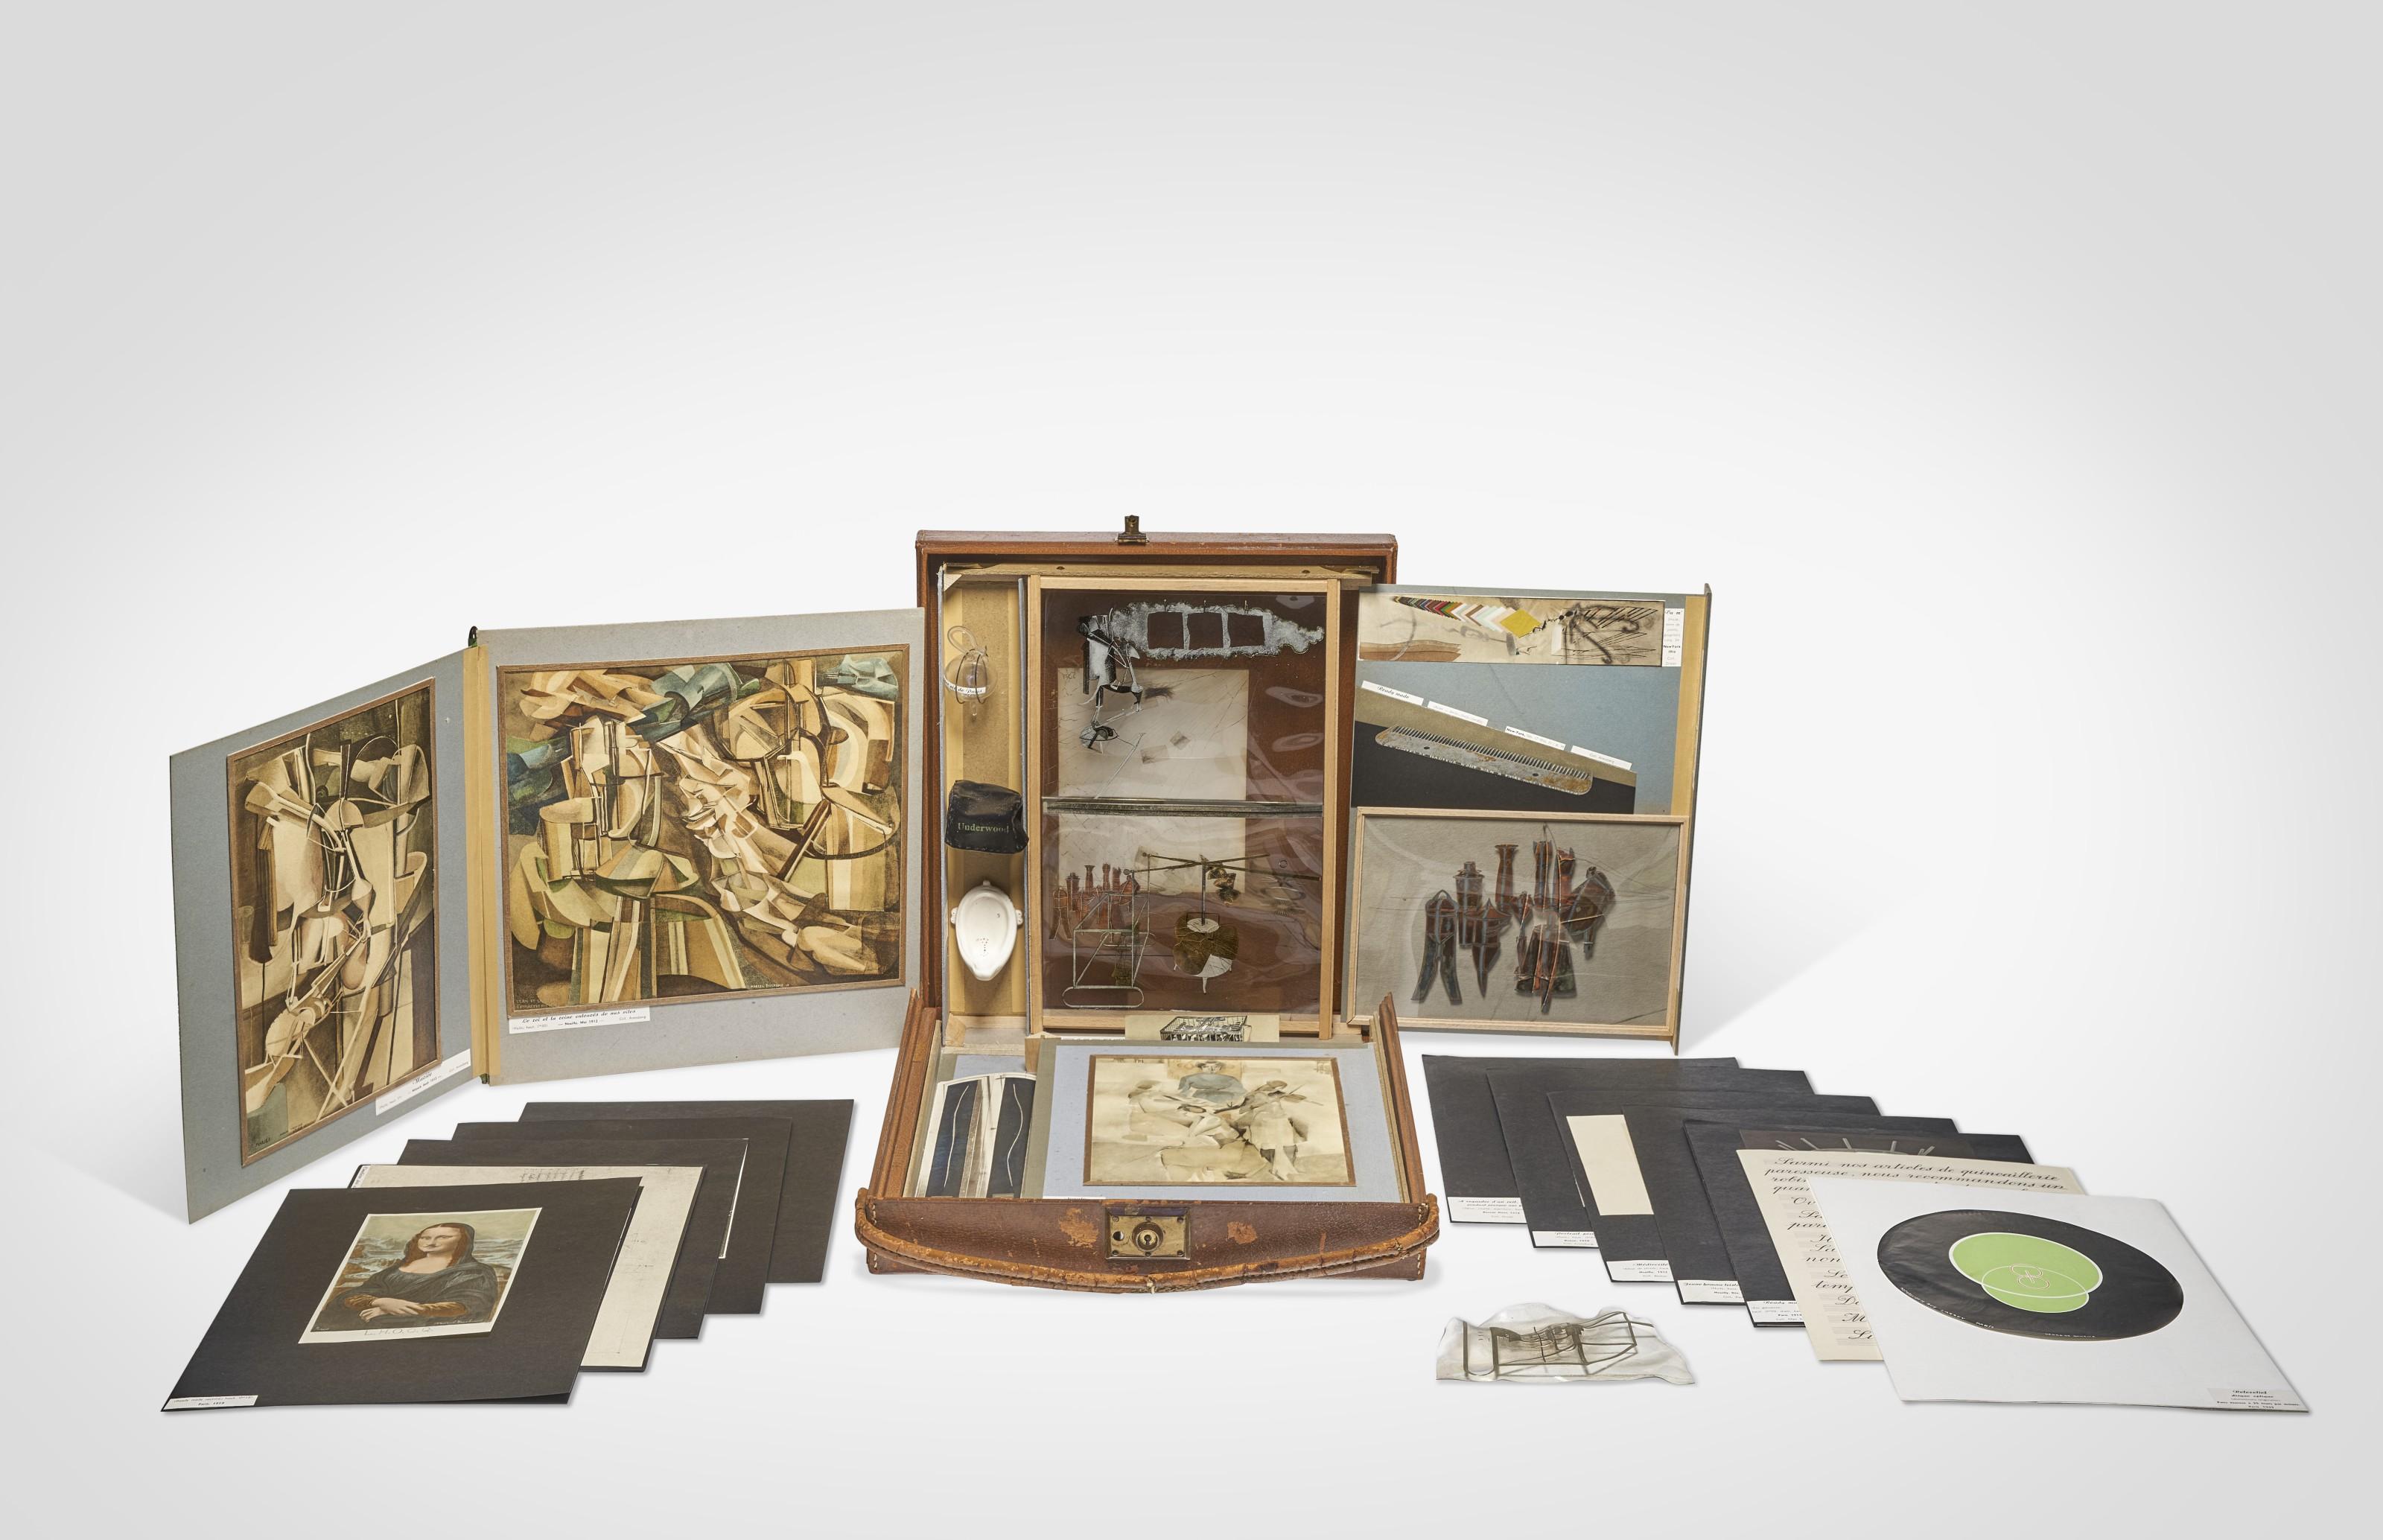 Marcel Duchamp (1887-1968), De ou par Marcel Duchamp ou Rrose Sélavy (La Boîte-en-valise), Series A Untitled. Valise 16⅛ x 15 x 4 in (41 x 38 x 10.2 cm). Box 15¼ x 14⅛ x 3 in (38.9 x 35.7 x 7.6  cm). Untitled 7½ x 6 in (19 x 15.2  cm). Estimate $2,000,000-3,000,000. Offered in 20th Century Evening Sale on 13 May 2021 at Christie's in New York